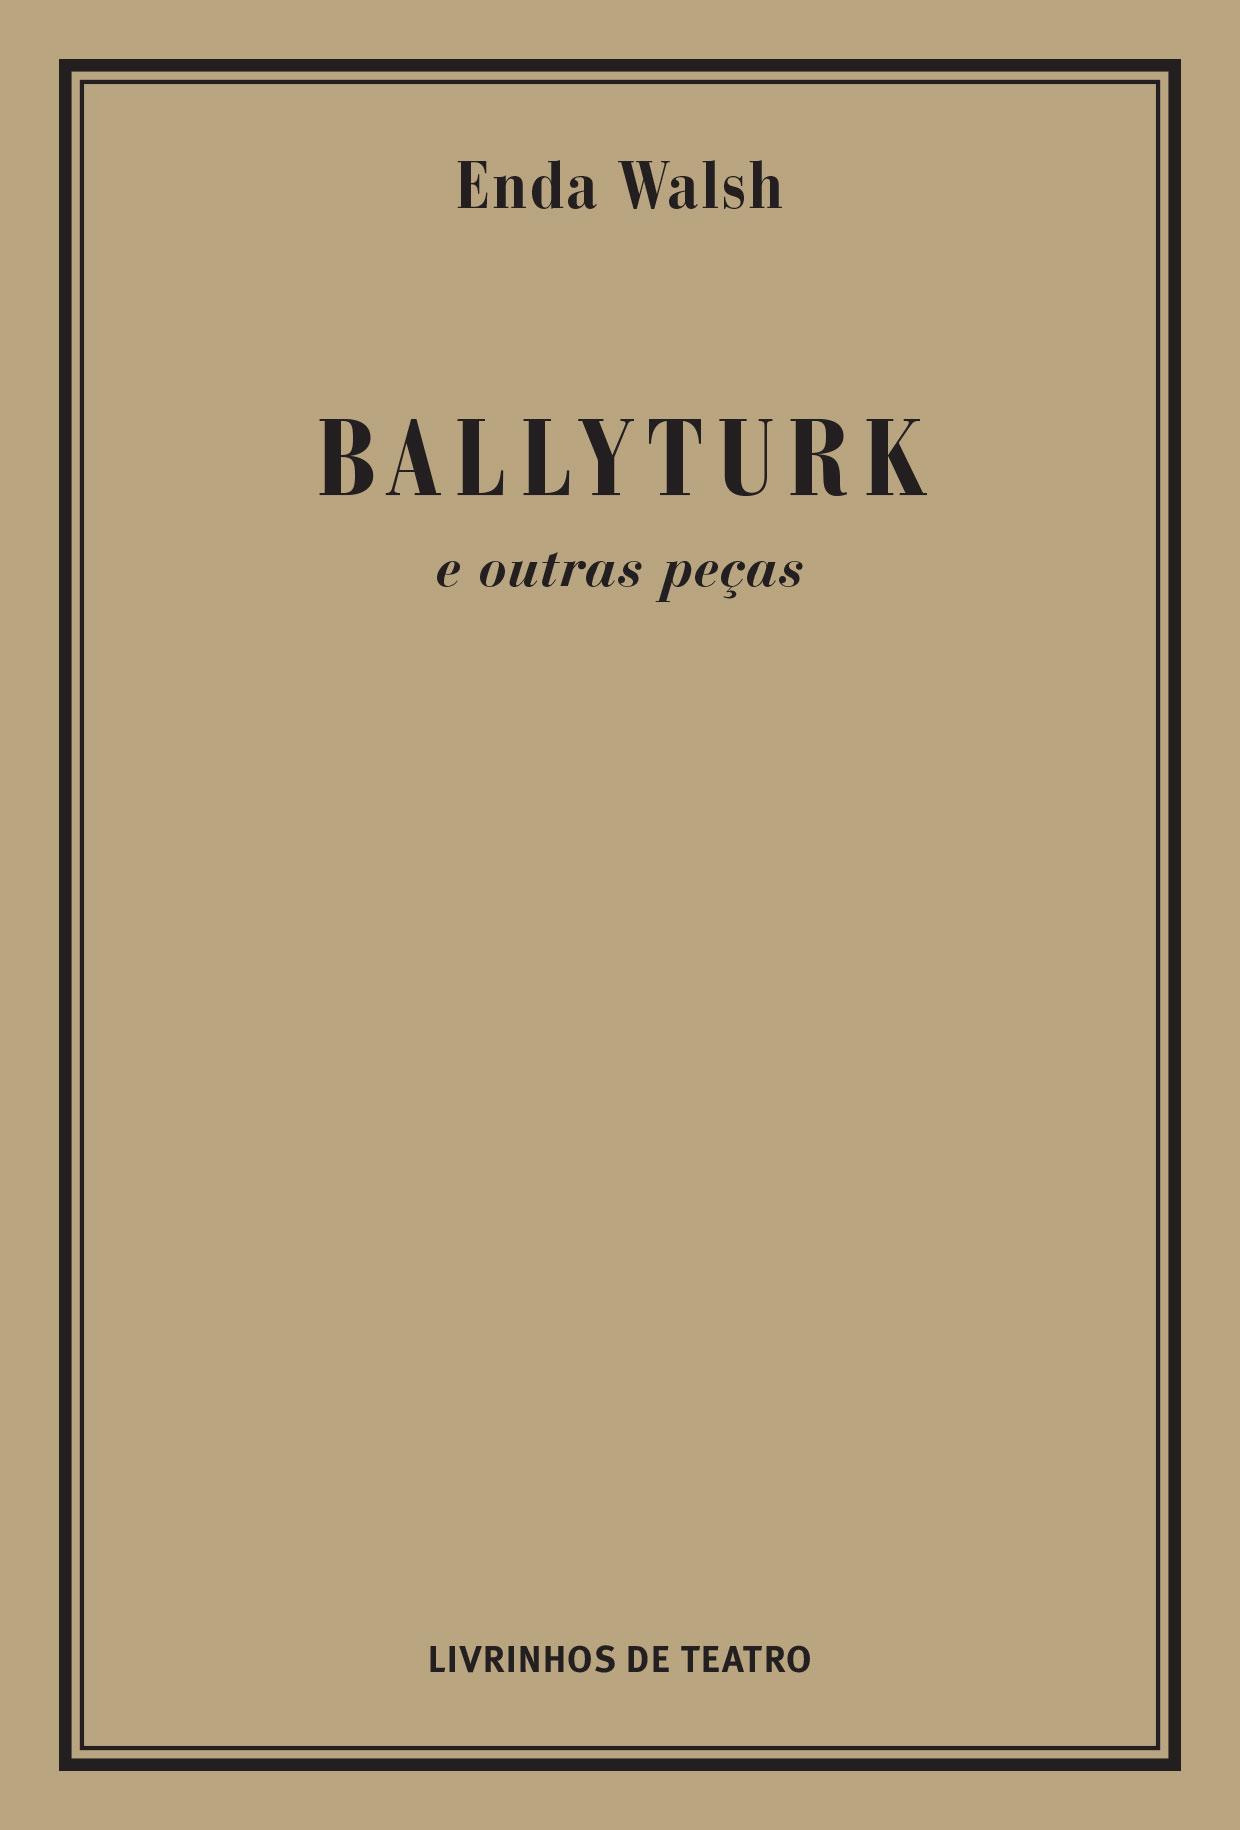 Ballyturk